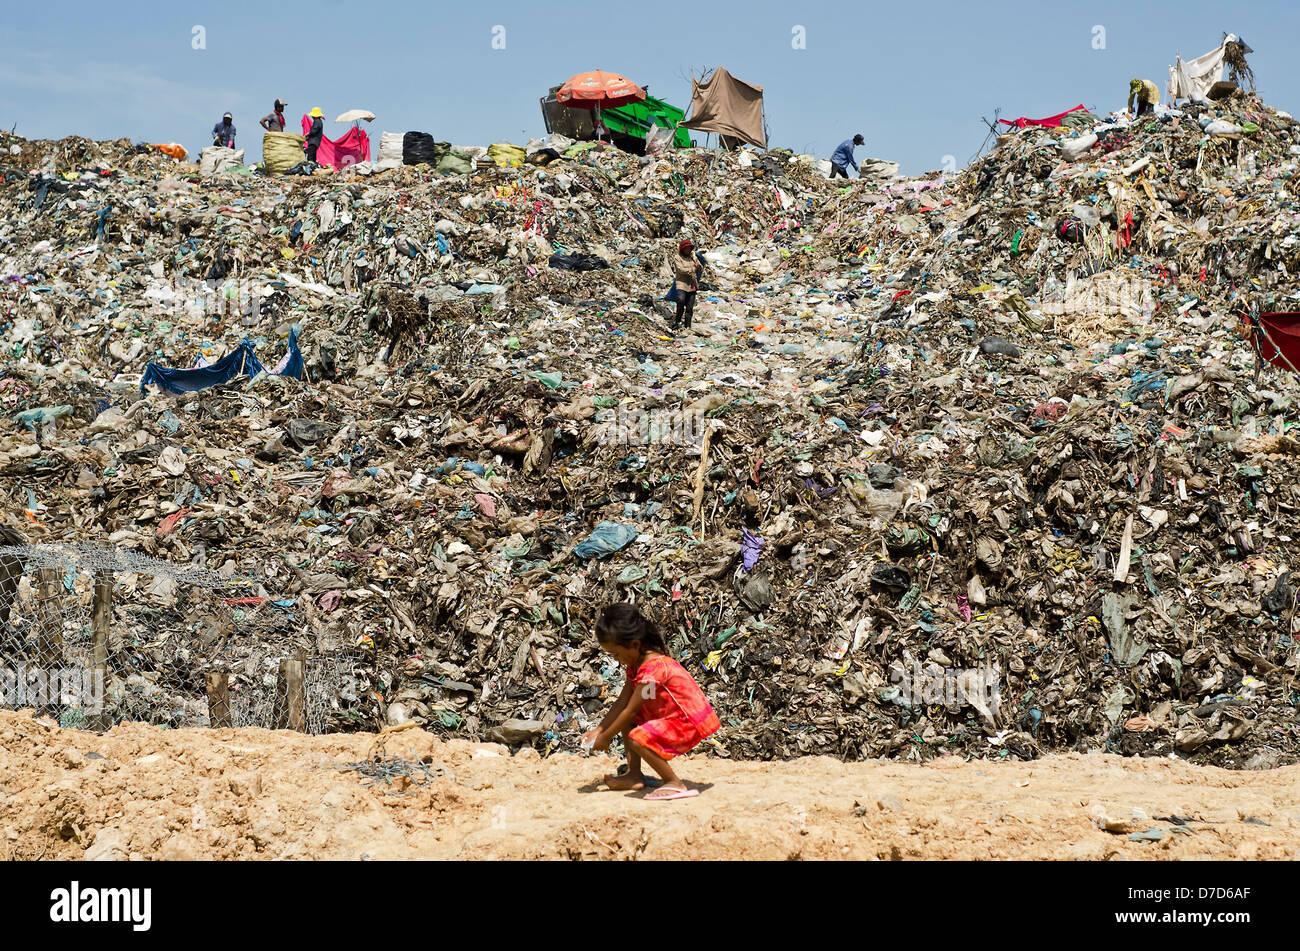 Tuol Sleng garbage dump,Phnom Penh,Cambodia - Stock Image